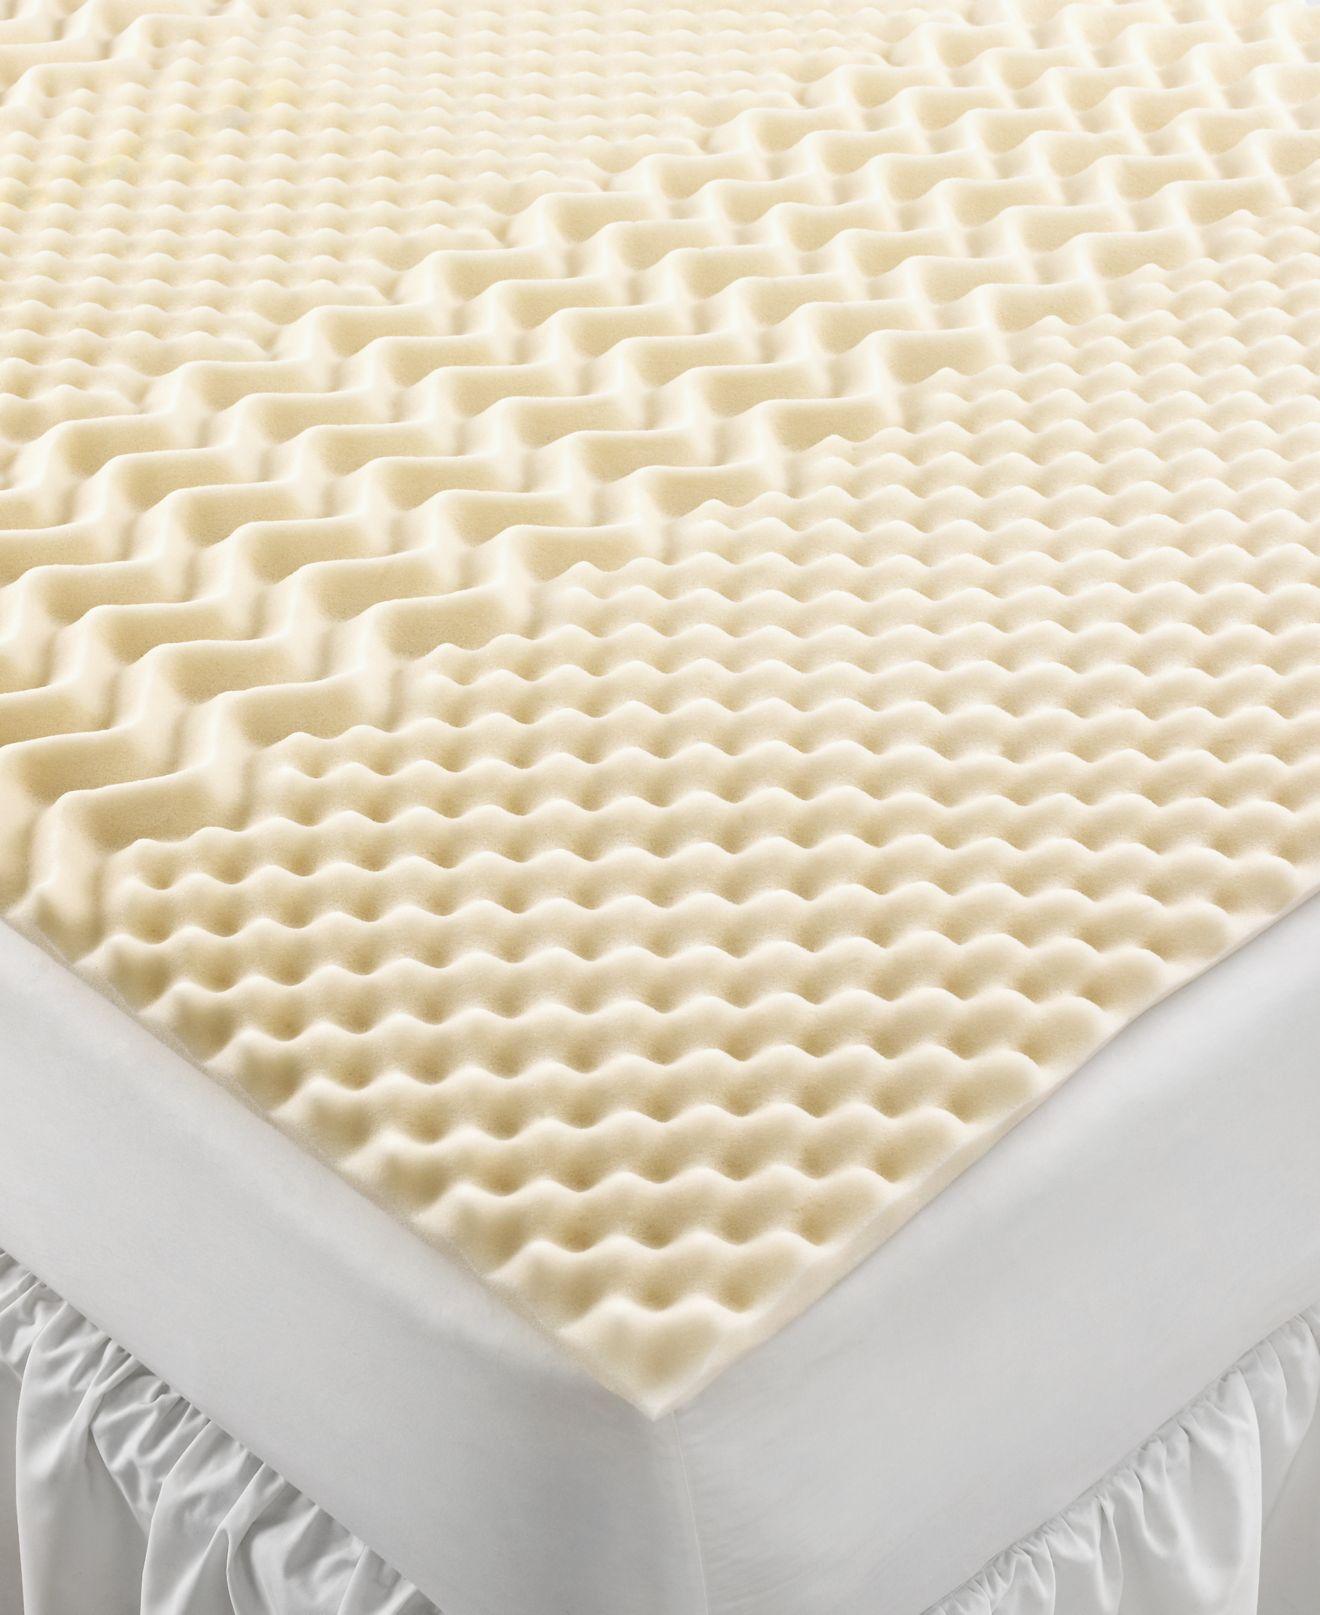 mattress pads - macy's